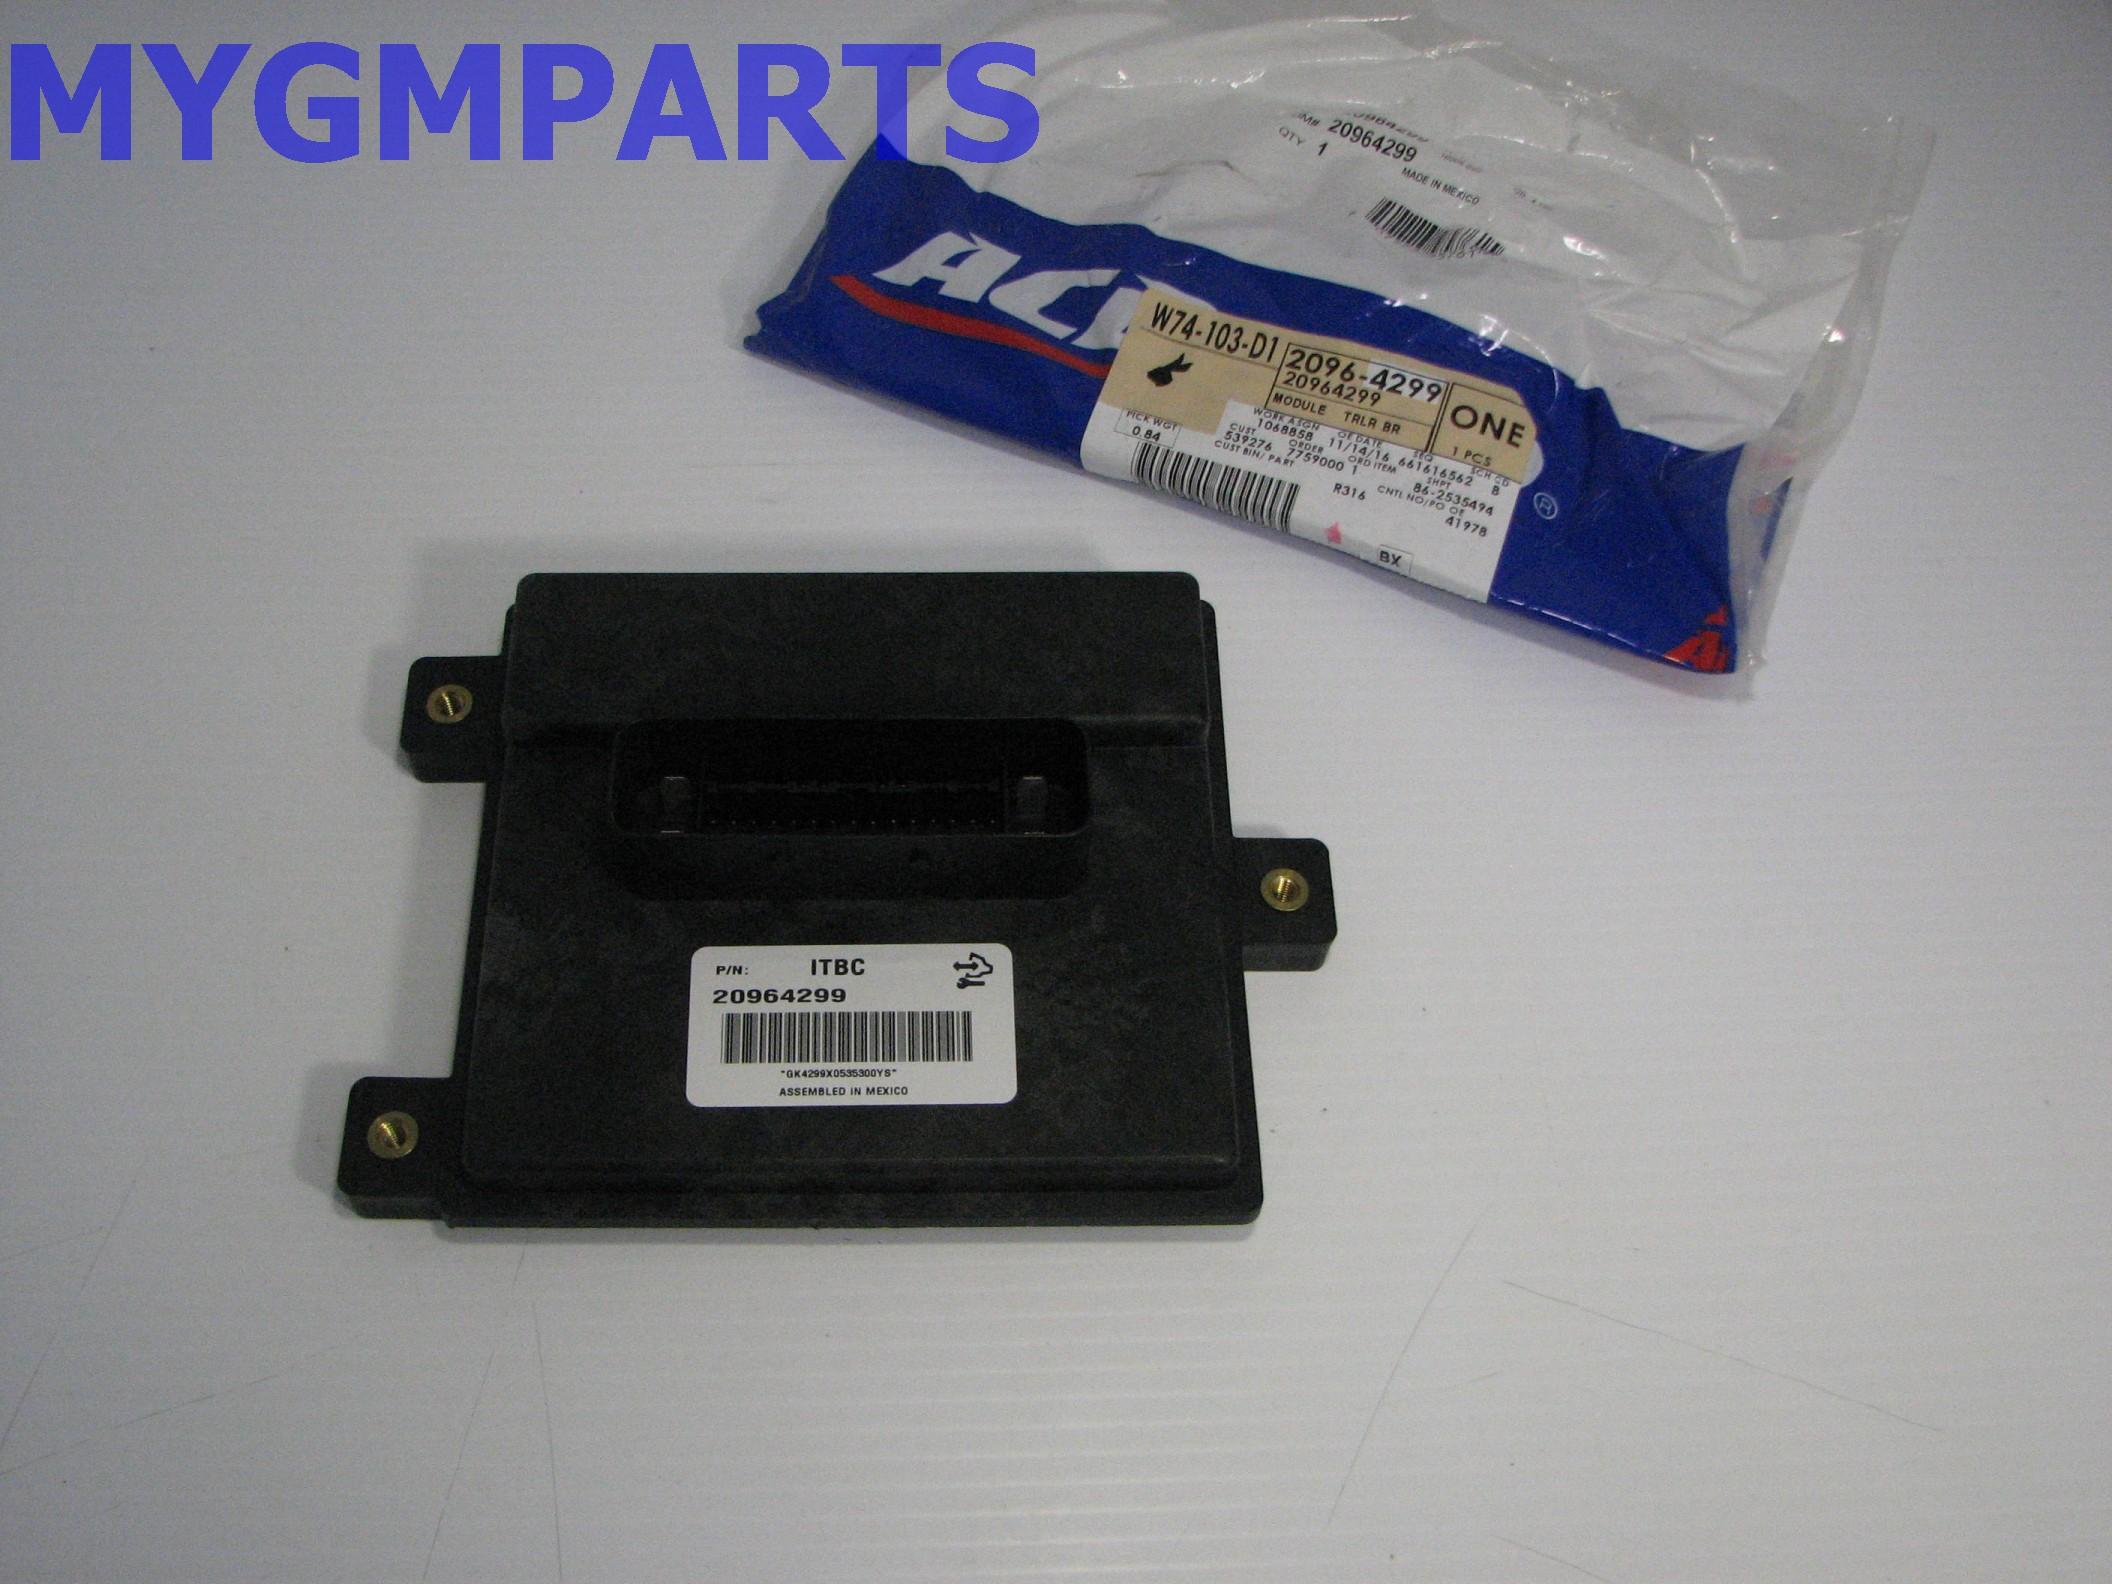 trailer brake warning chevy silverado 2001 ford f150 factory stereo wiring diagram sierra control module 2013 2014